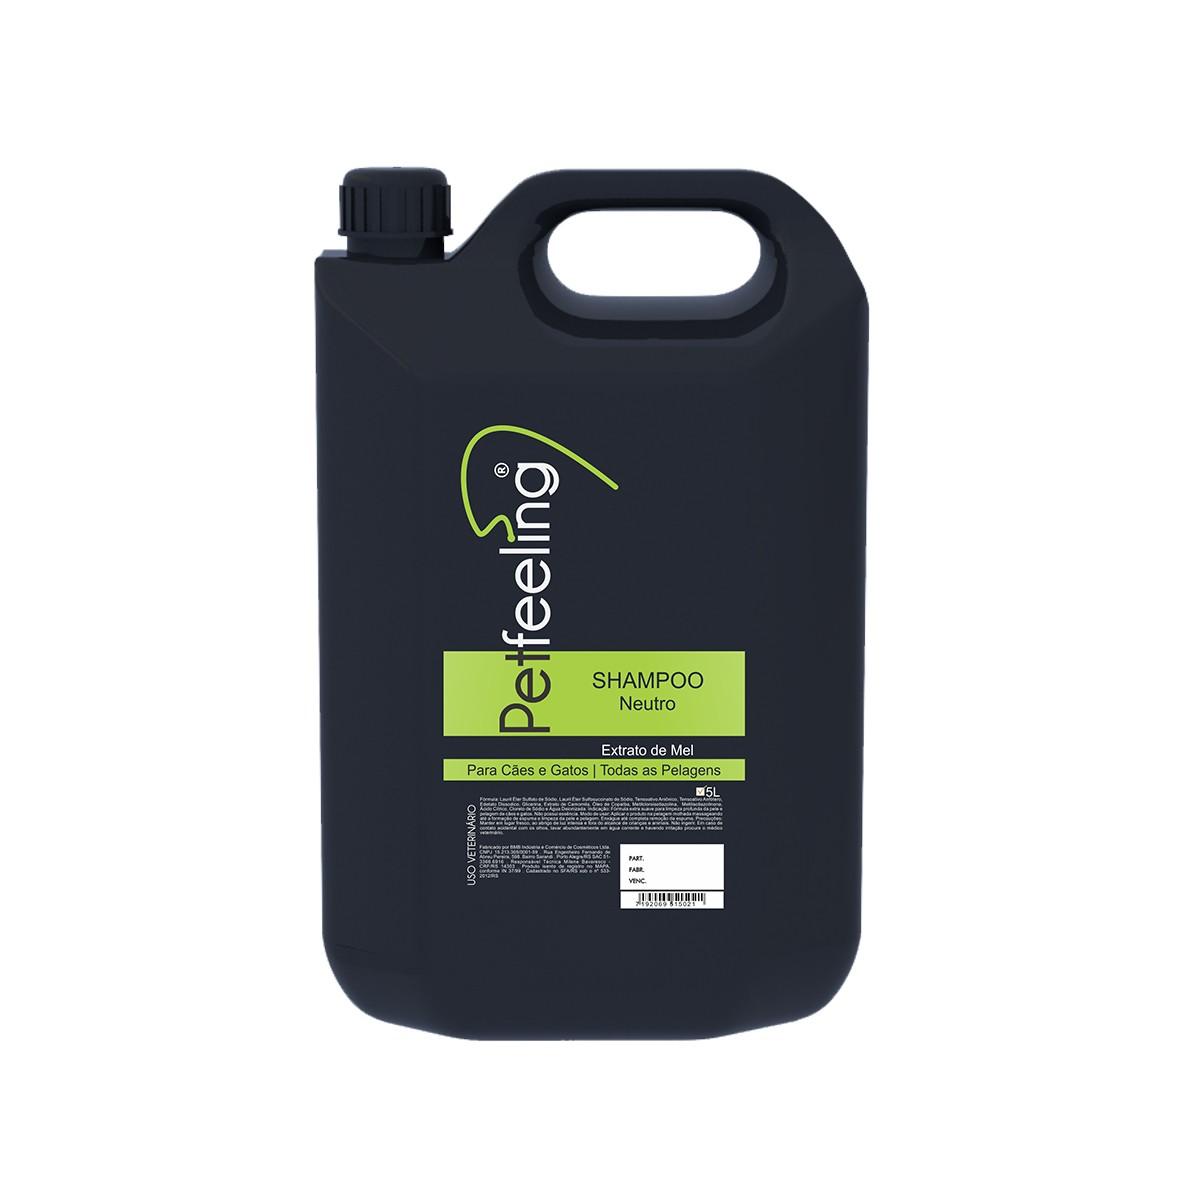 Shampoo Neutro 5L Petfeeling